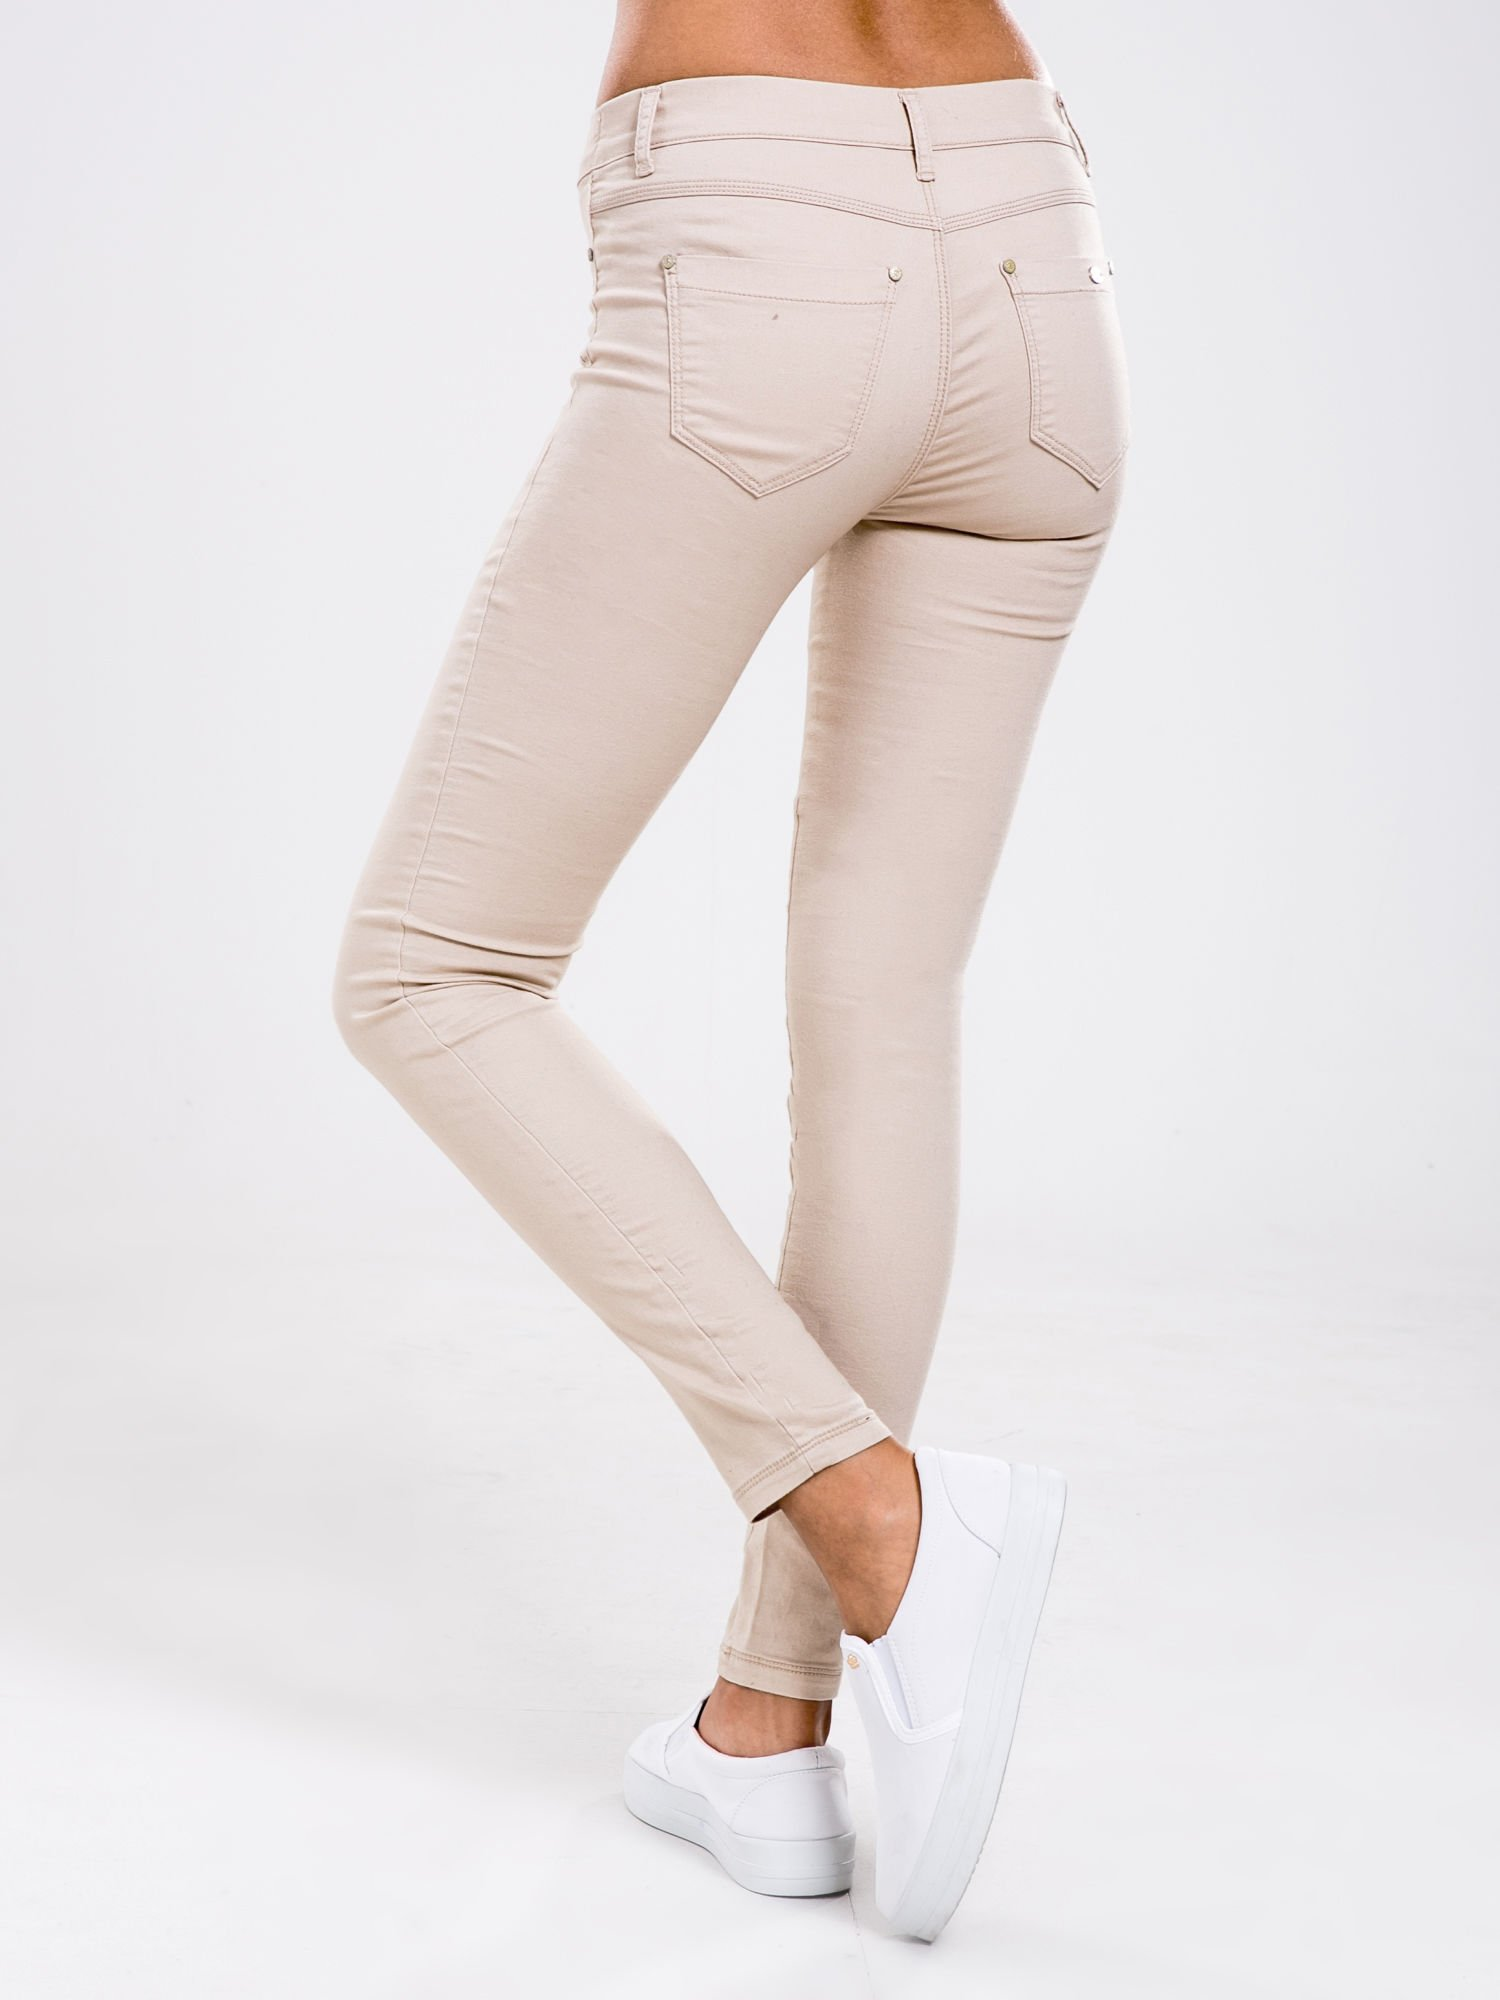 STRADIVARIUS Beżowe spodnie skinny typu jegginsy                                  zdj.                                  2